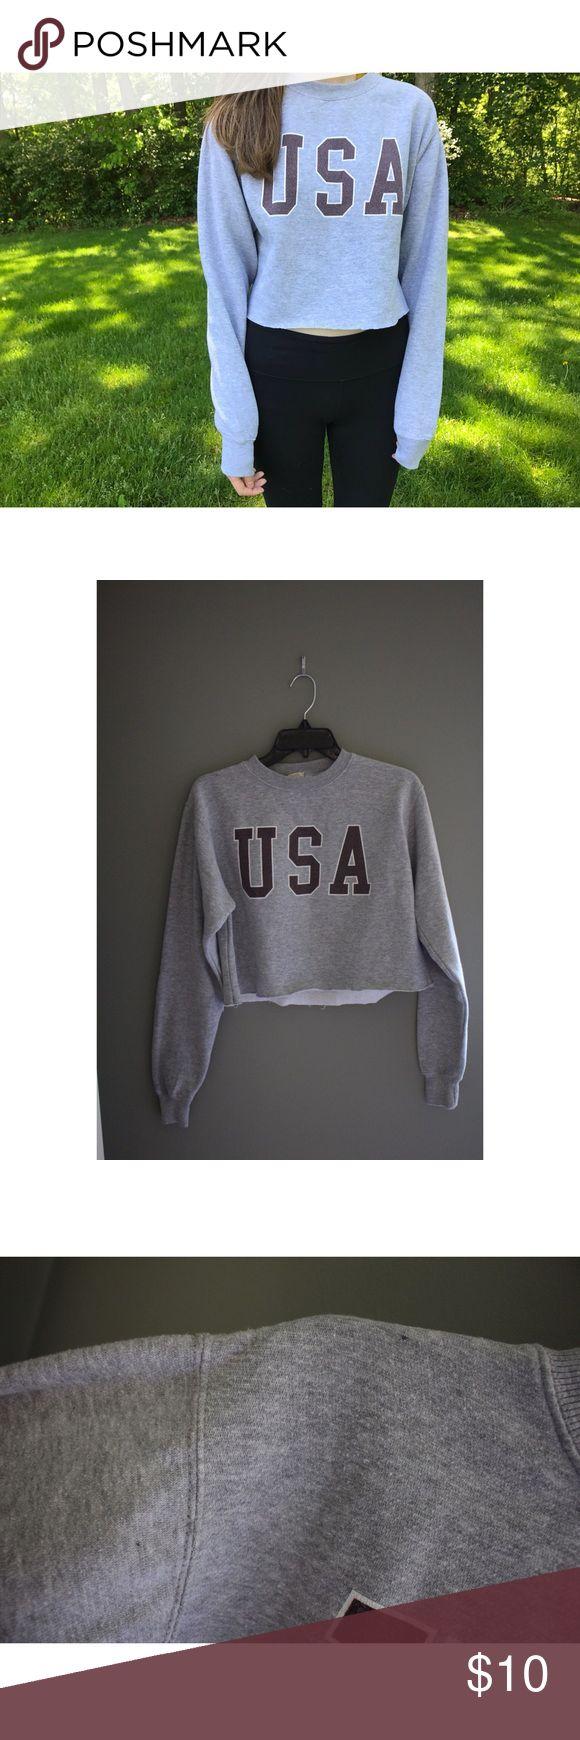 "ᴘᴀᴄsᴜɴ USA Cozy Cropped Sweatshirt 🇺🇸 ʙʀᴀɴᴅ- John Galt  ᴄᴏɴᴅɪᴛɪᴏɴ- Used, two small black dot stains near left shoulder ᴍᴀᴛᴇʀɪᴀʟ- 70% cotton, 30% polyester ʙᴇsᴛ ғɪᴛ- One size! 💫don'т вe aғraιd тo oғғer 💫no тradeѕ Model is 5'9"" and wears a size small Thanks for shopping with me! 🐈 PacSun Sweaters Crew & Scoop Necks"